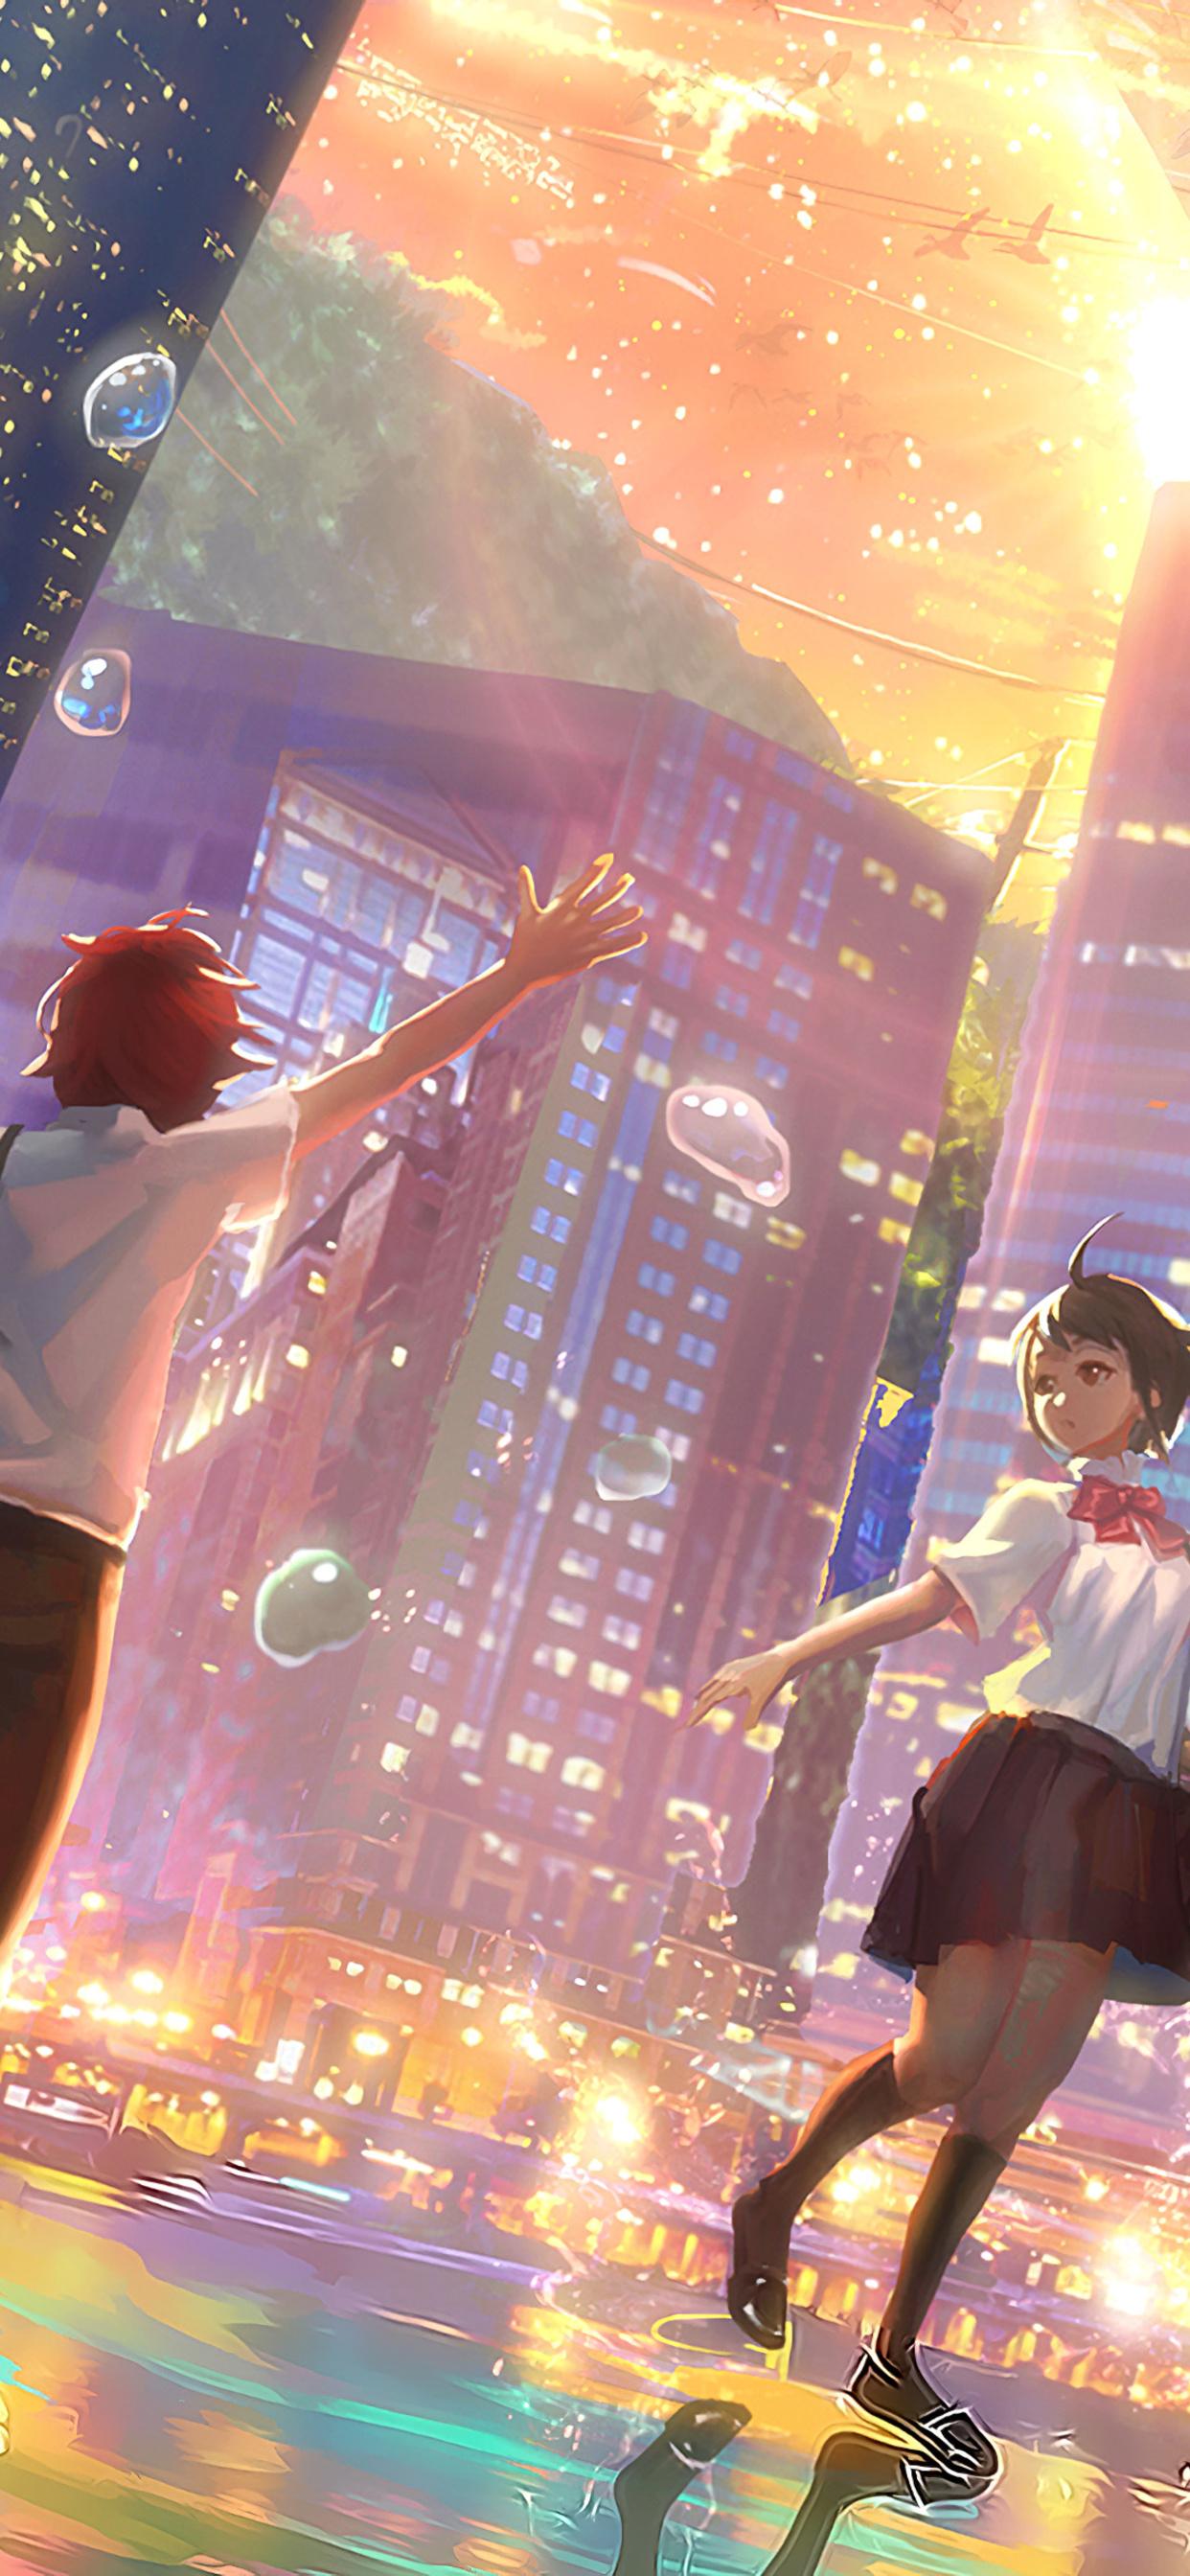 anime-girl-boy-school-dress-4k-xe.jpg